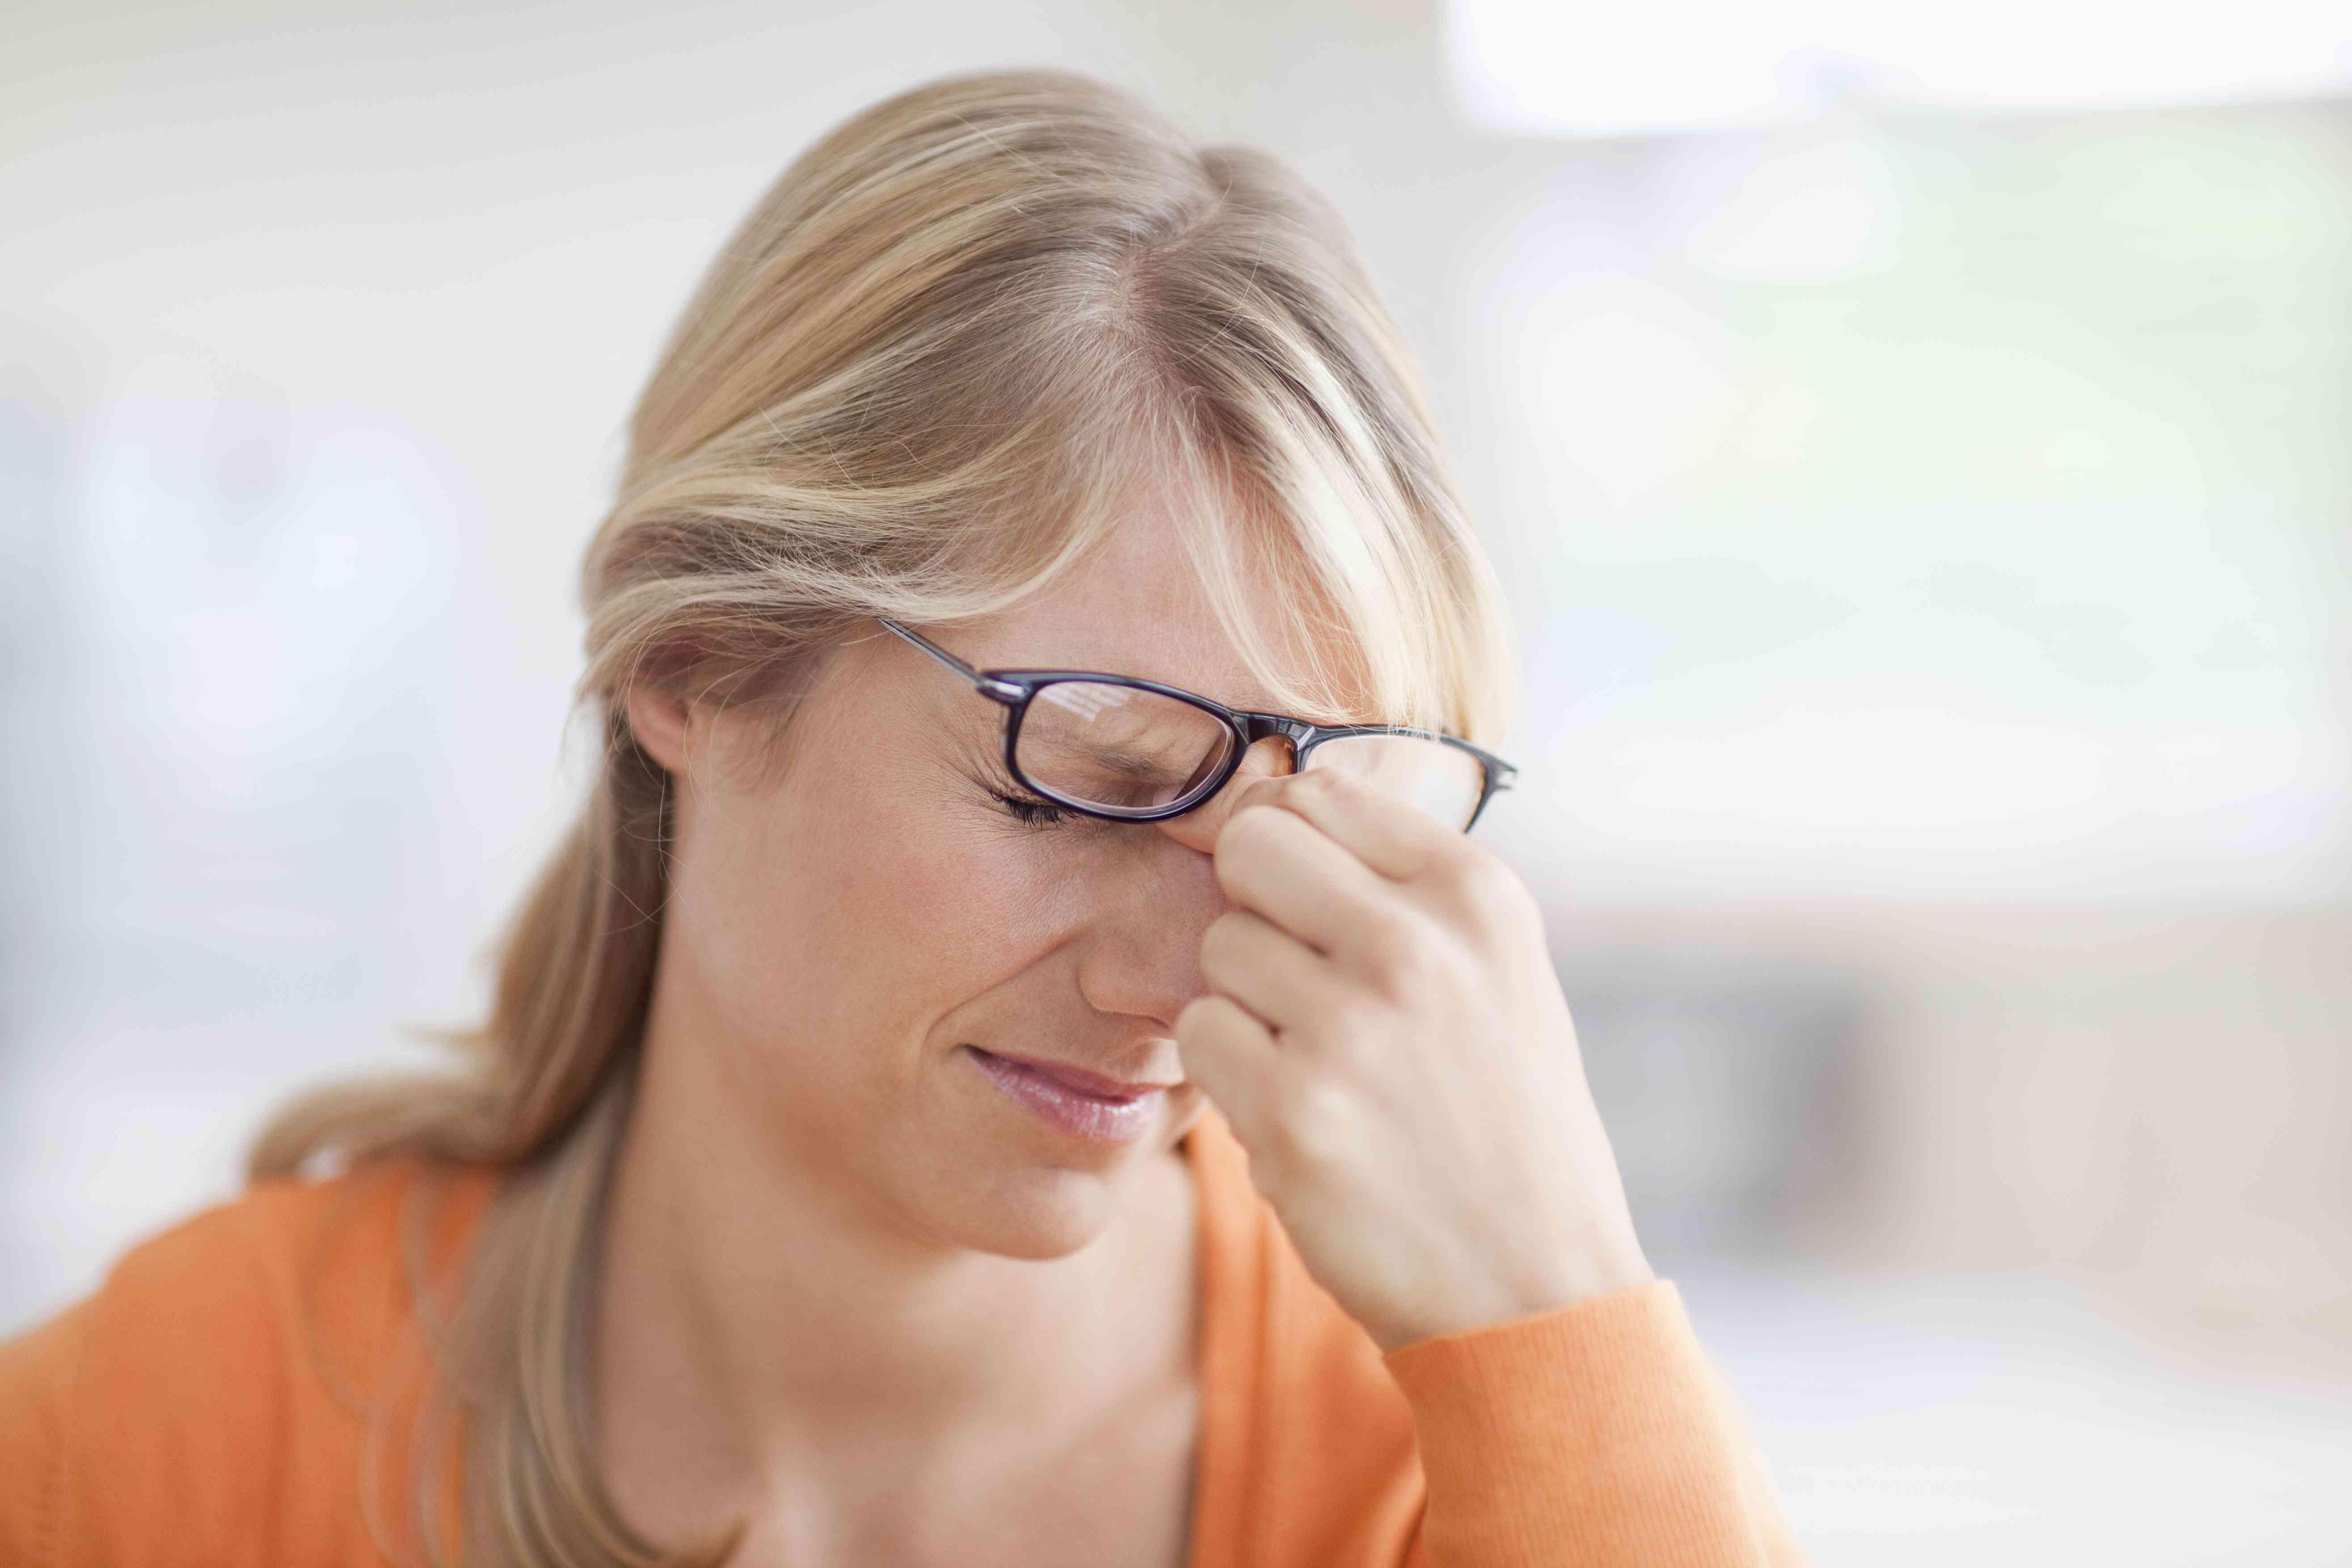 A woman with an extreme headache